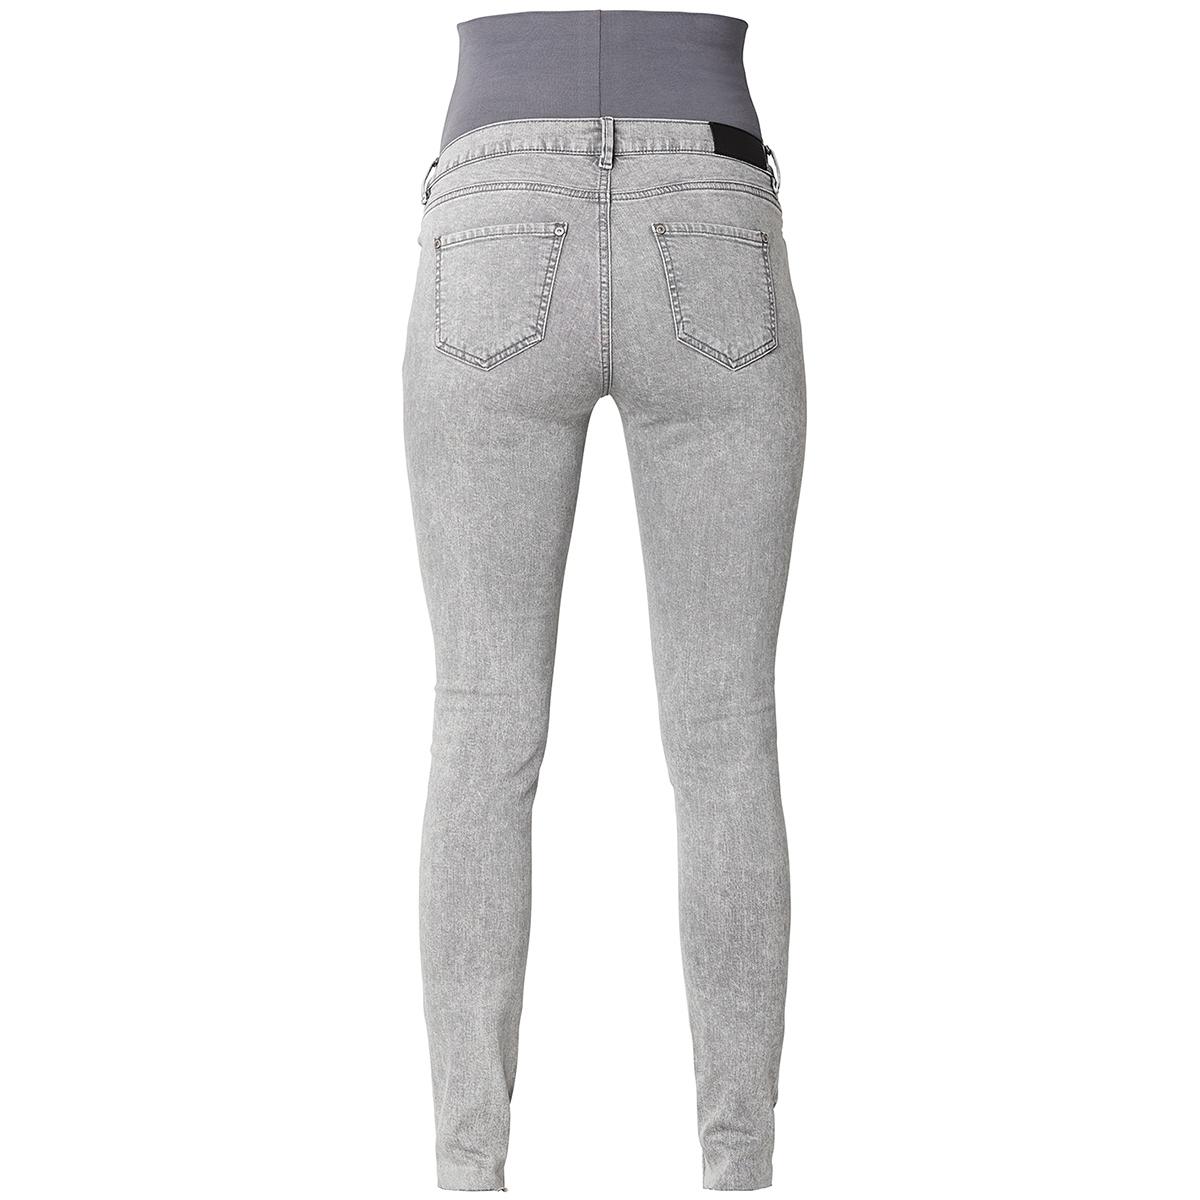 s0667 jeans skinny supermom positie broek grey denim